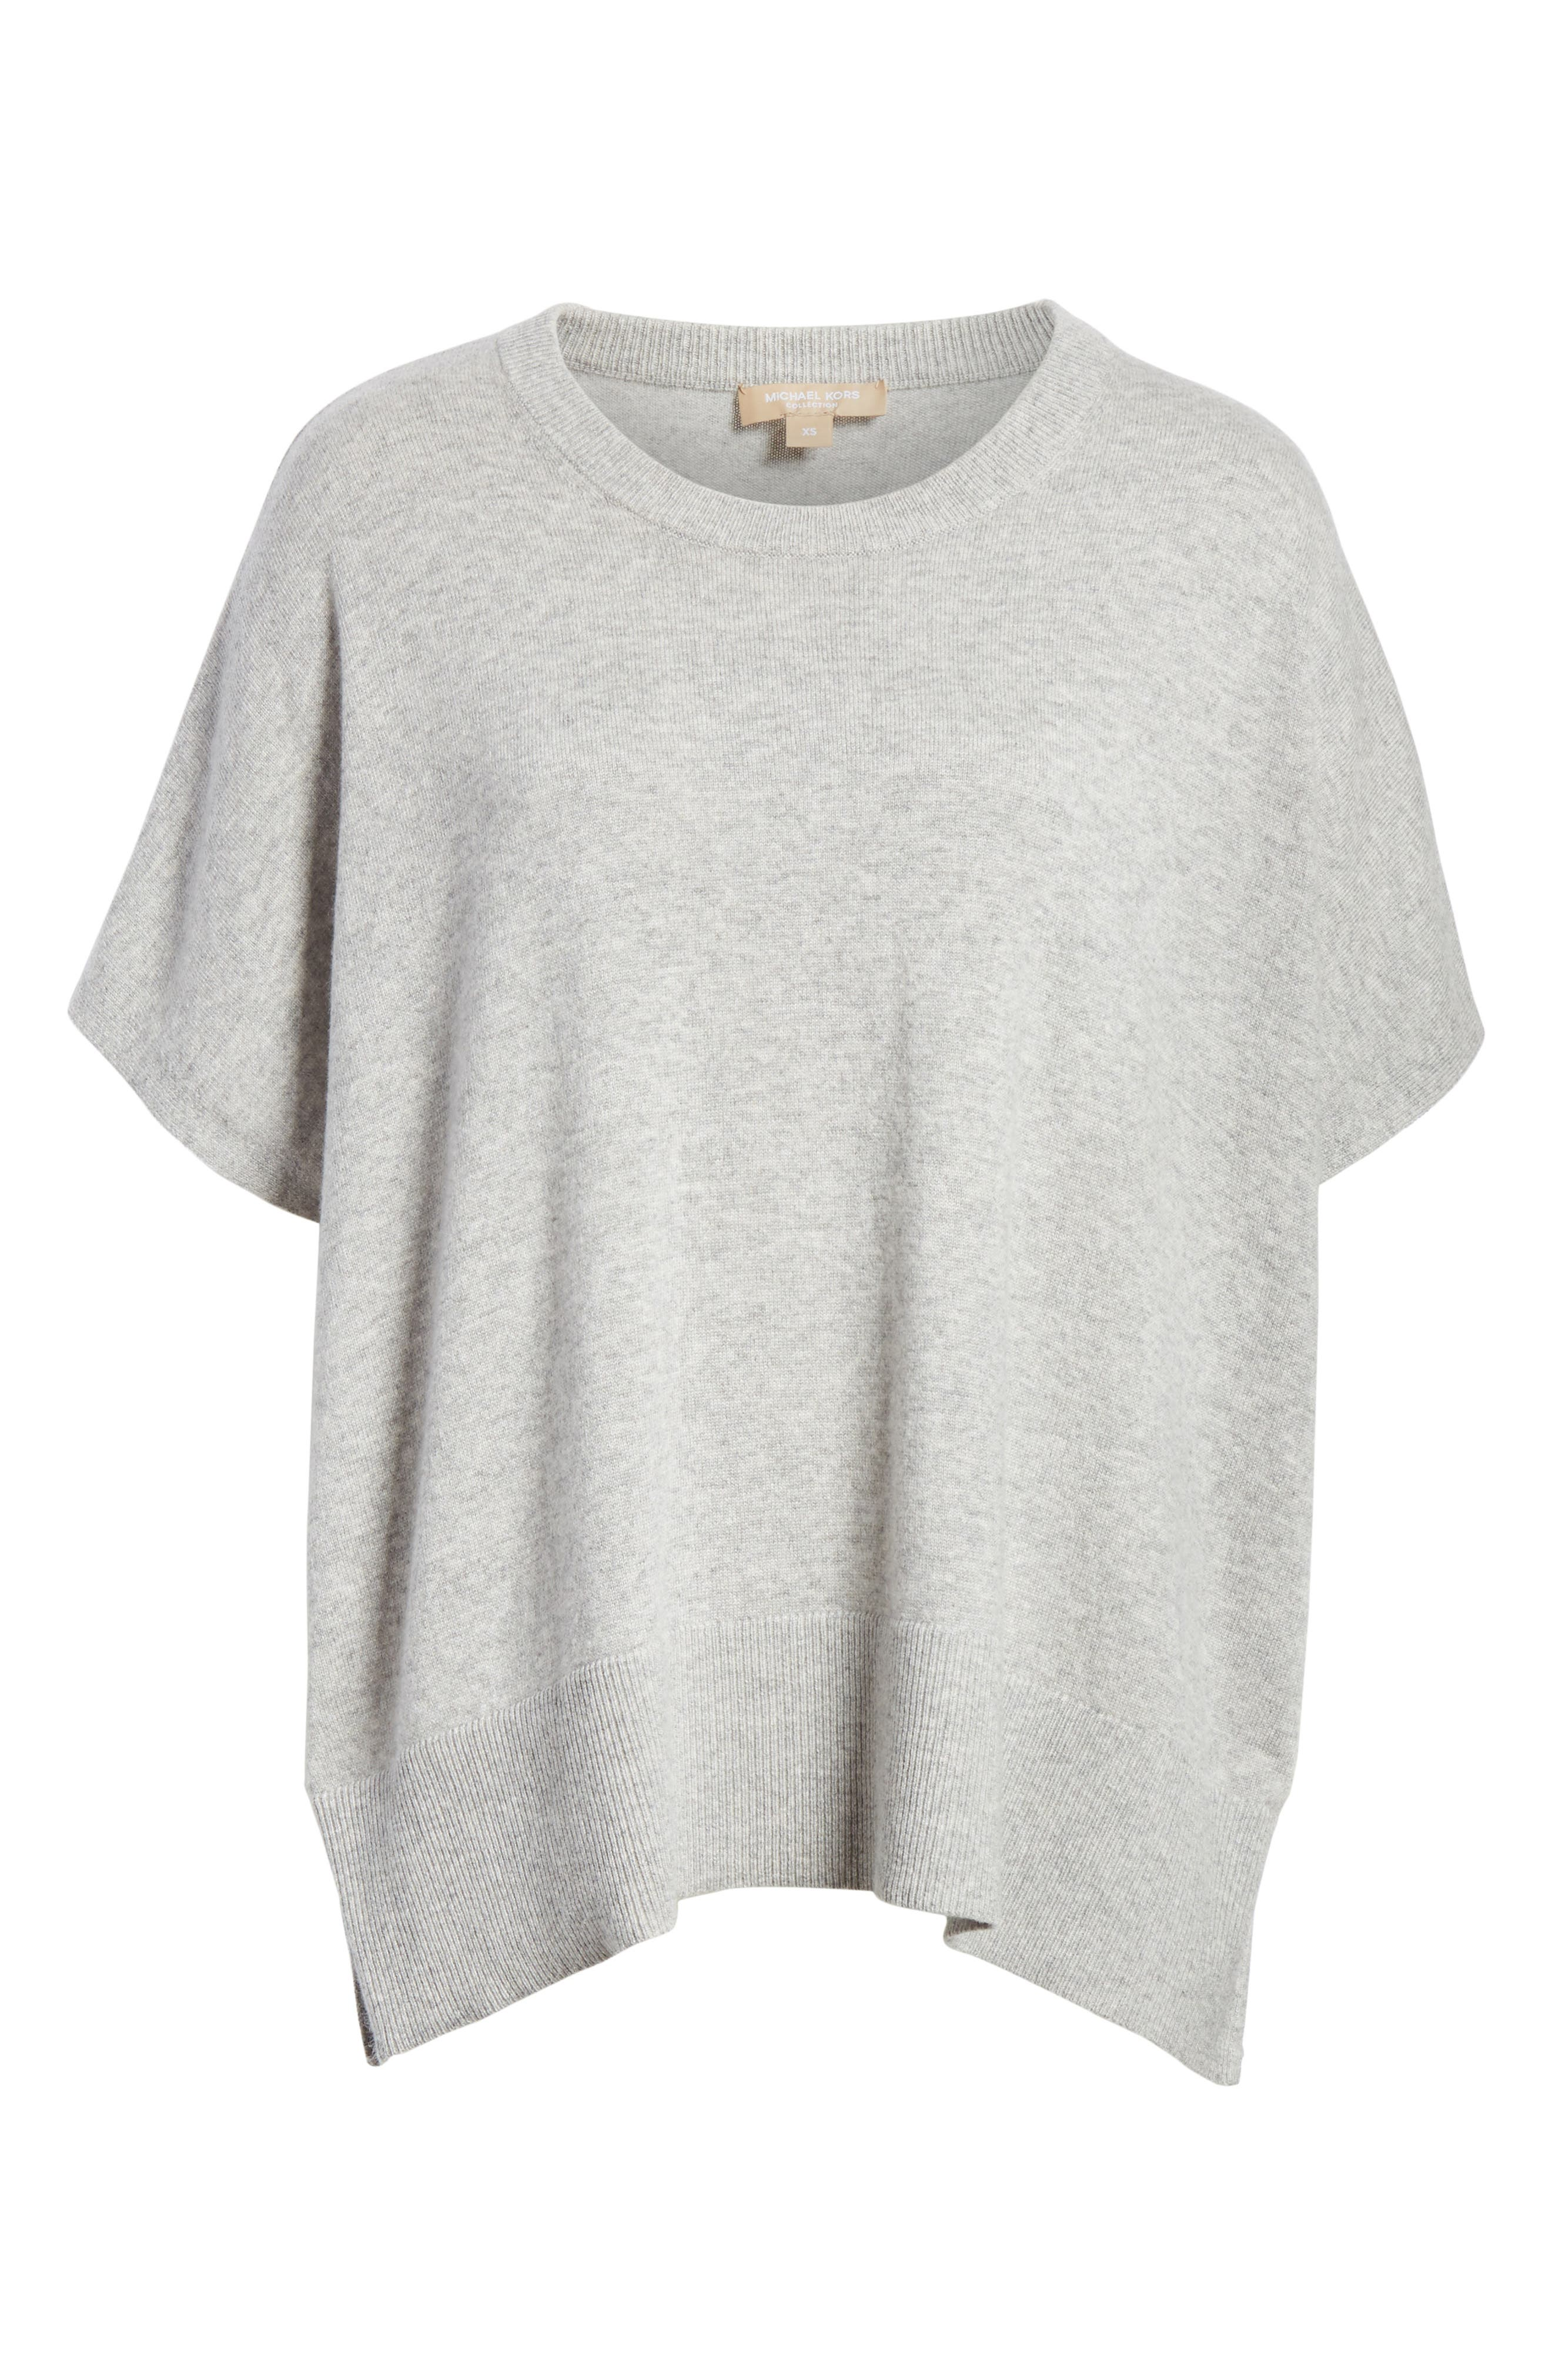 Cashmere Draped Pullover,                             Alternate thumbnail 7, color,                             PEARL GREY MELANGE